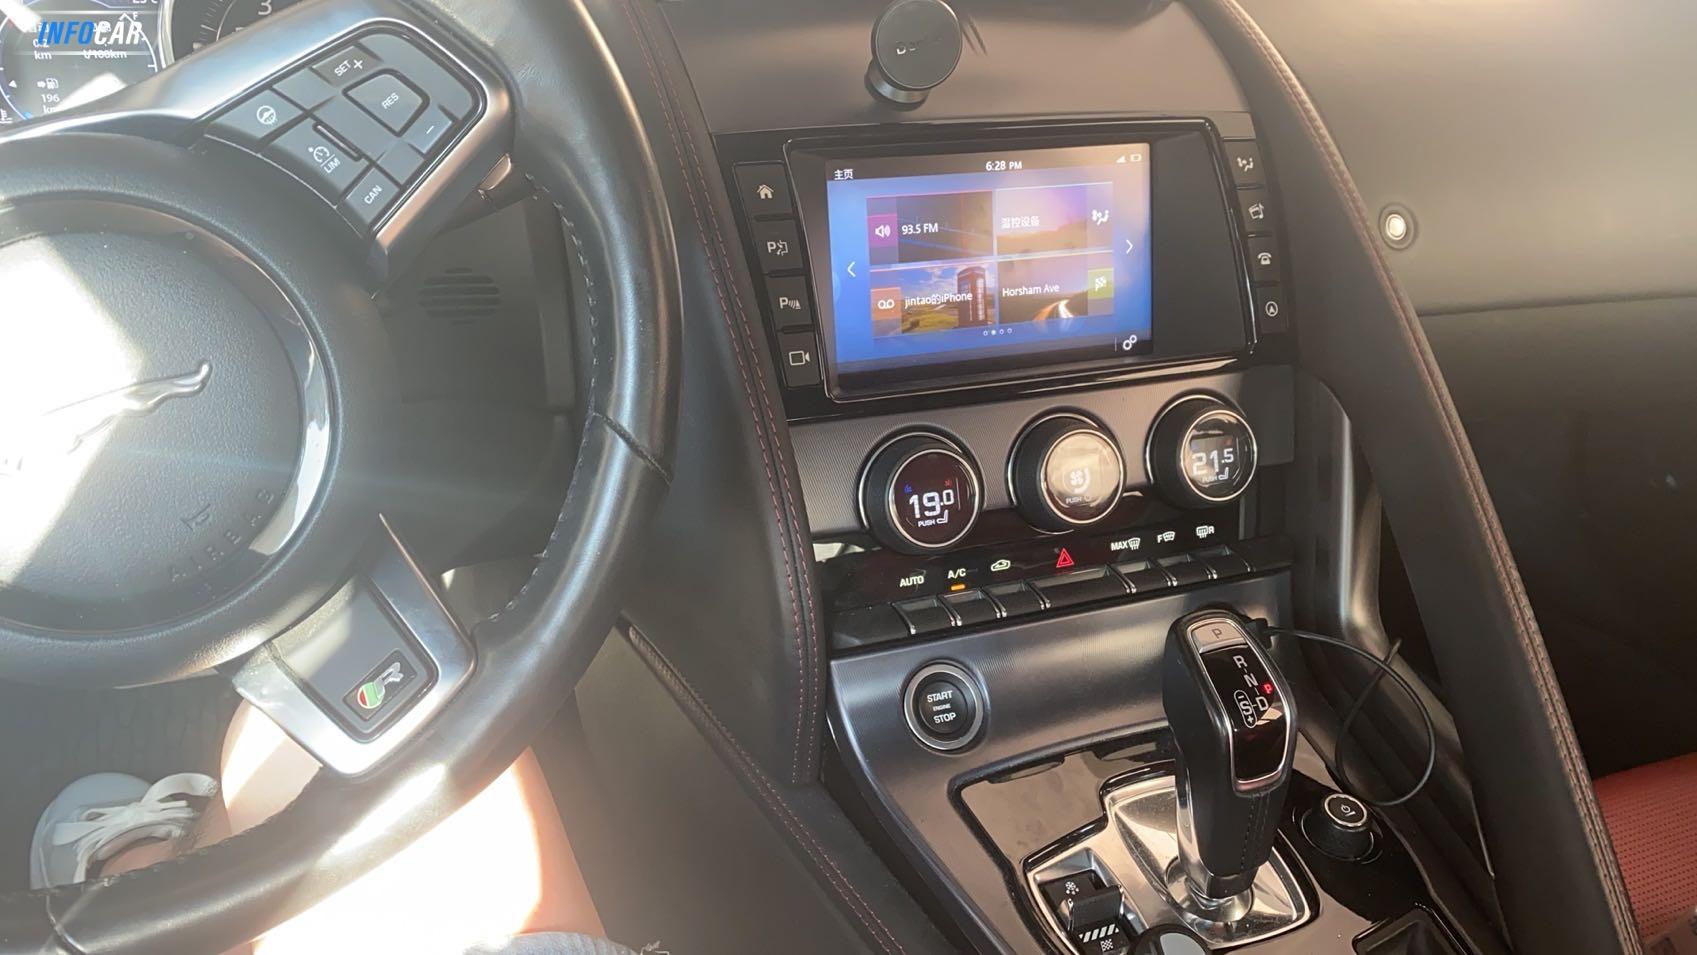 2018 Jaguar F Type R - INFOCAR - Toronto's Most Comprehensive New and Used Auto Trading Platform